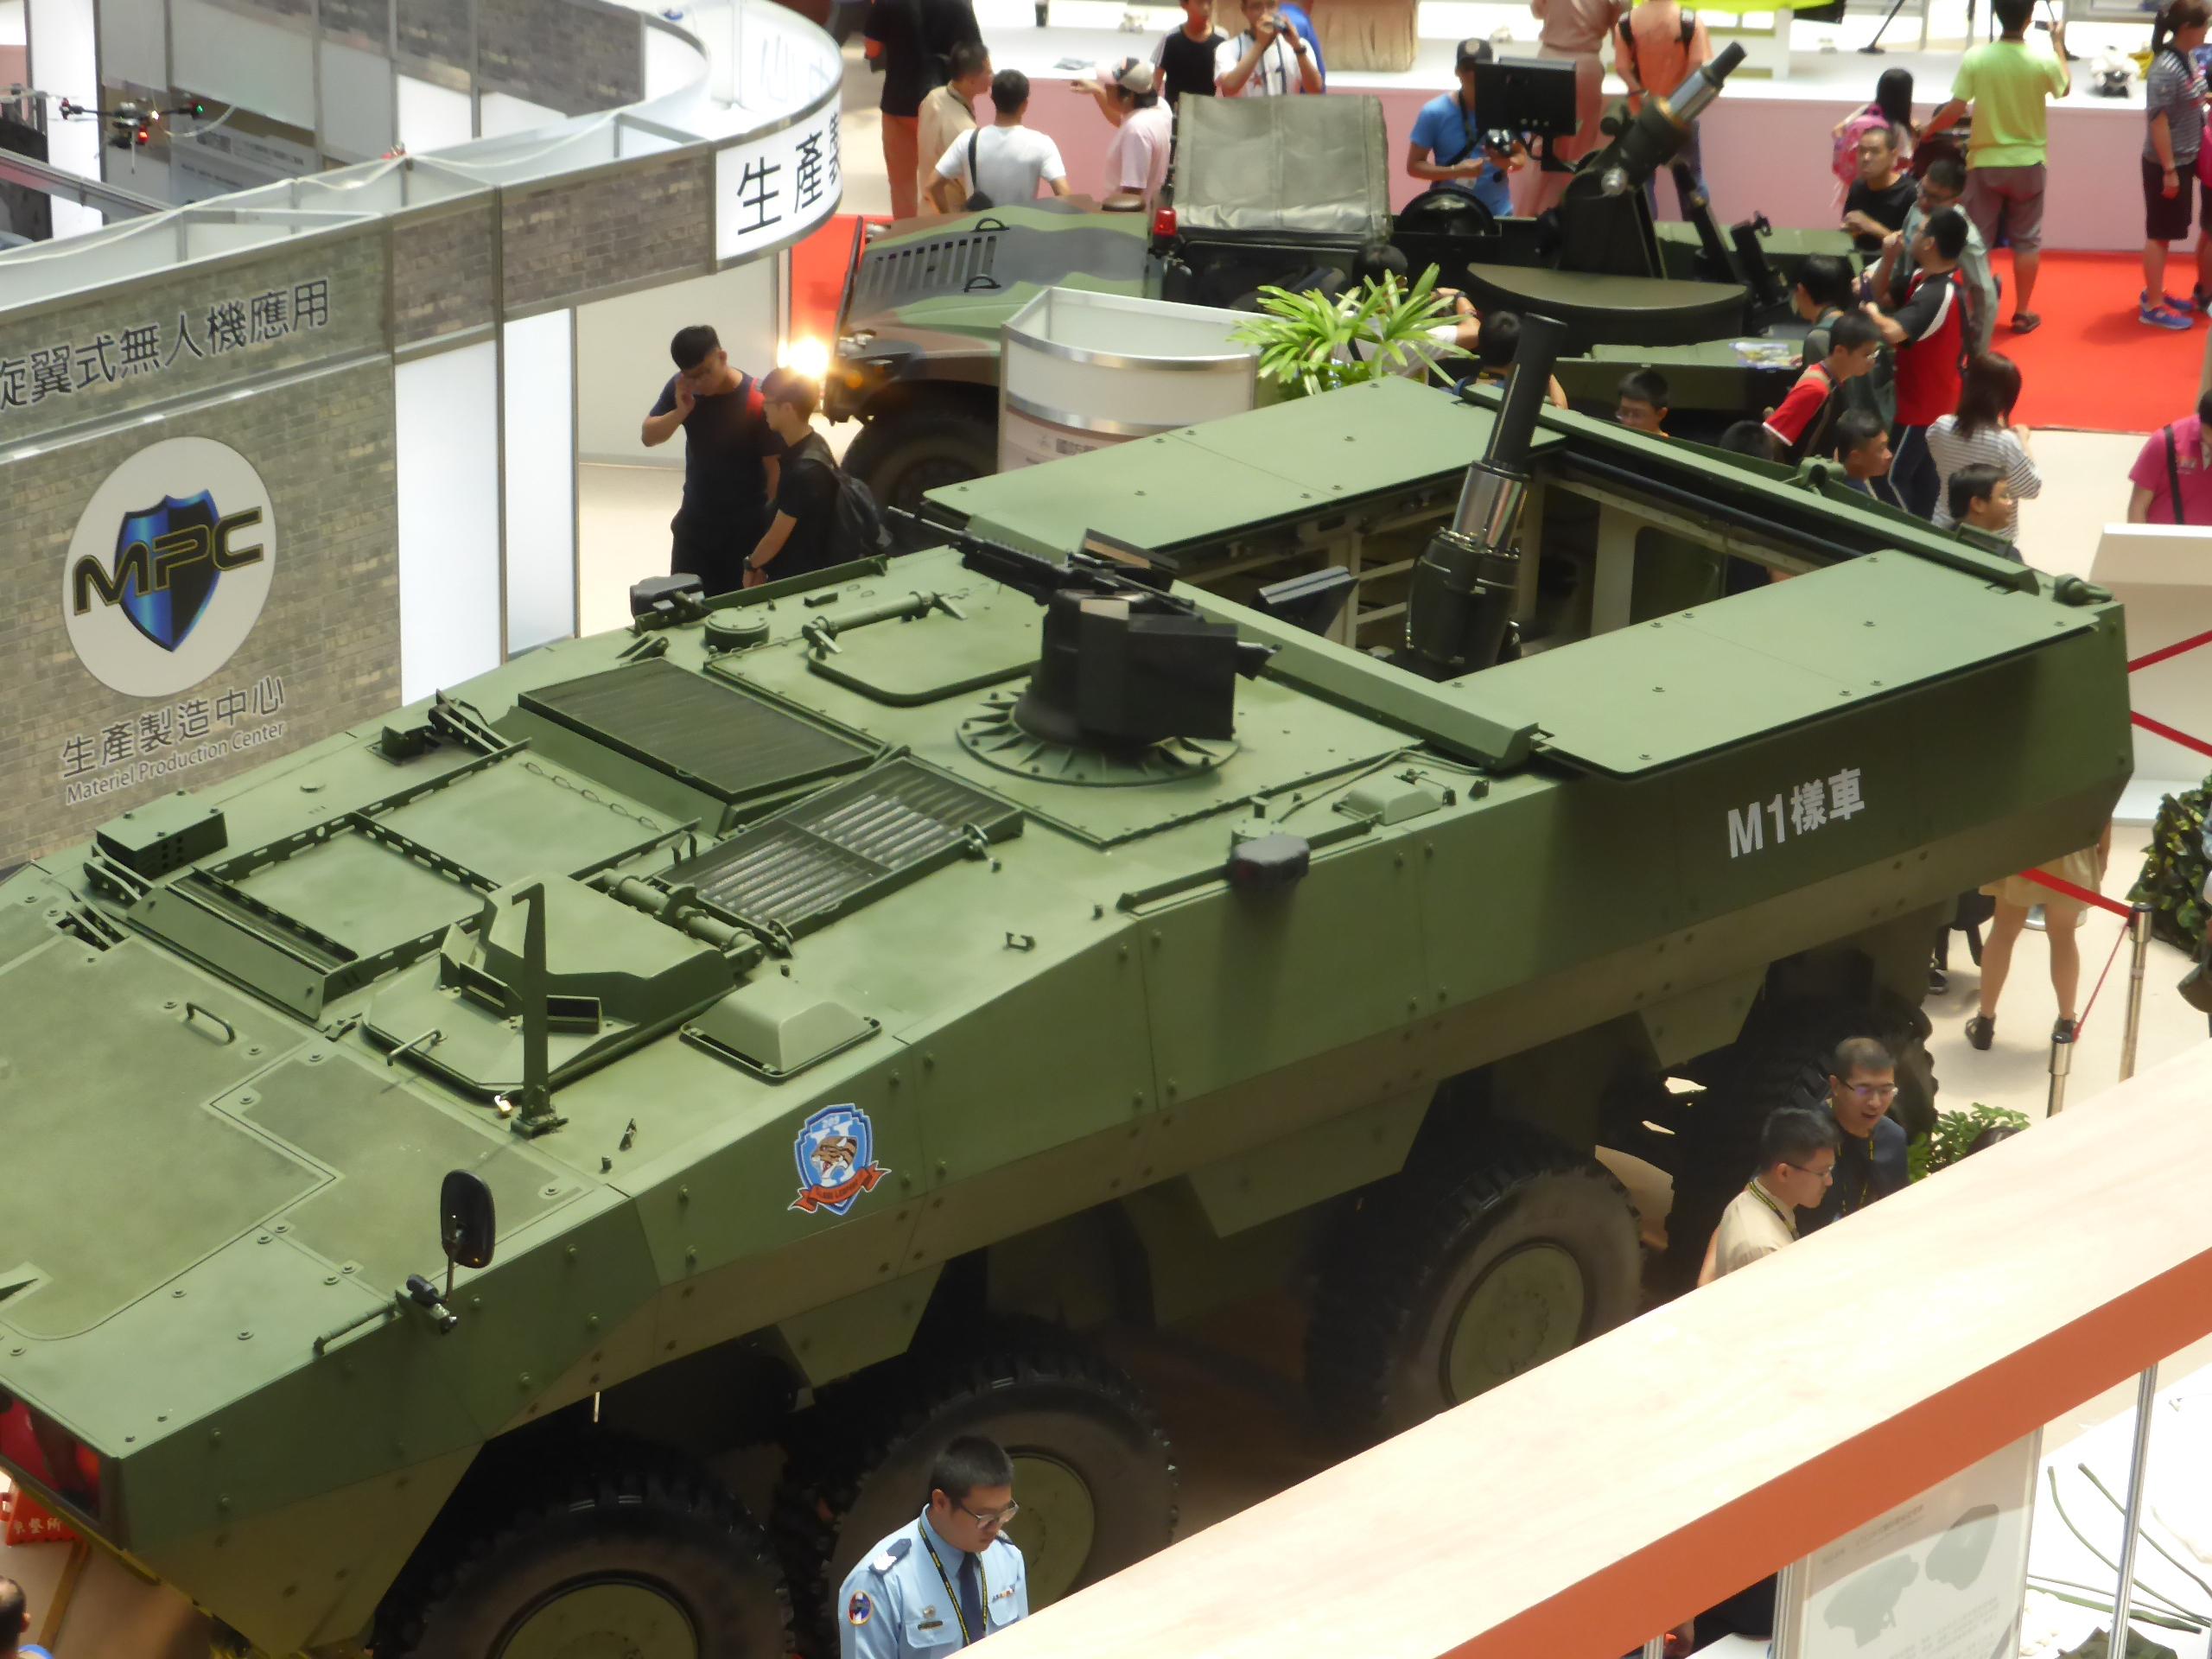 CM-32 Mortar Variant Revealed ...